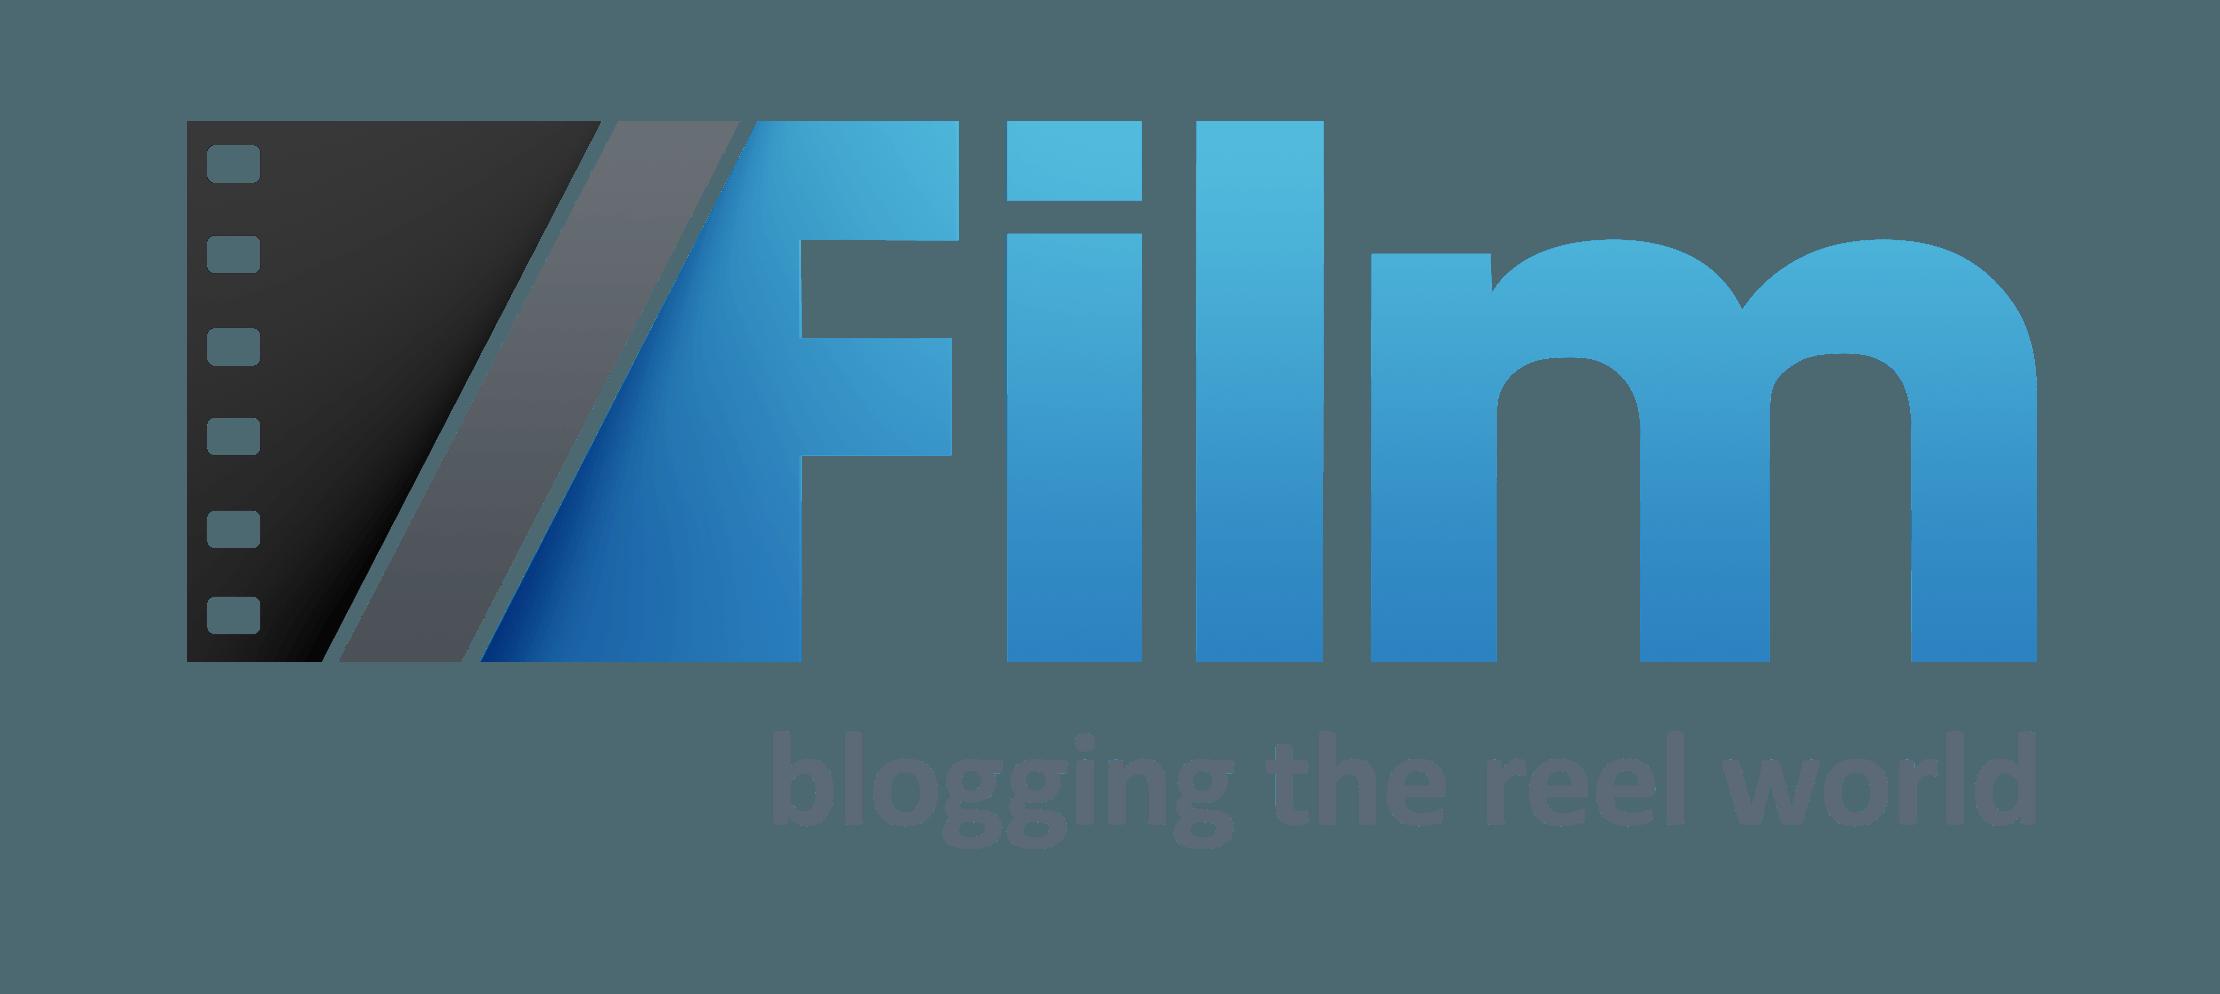 slashfilm-logo.png